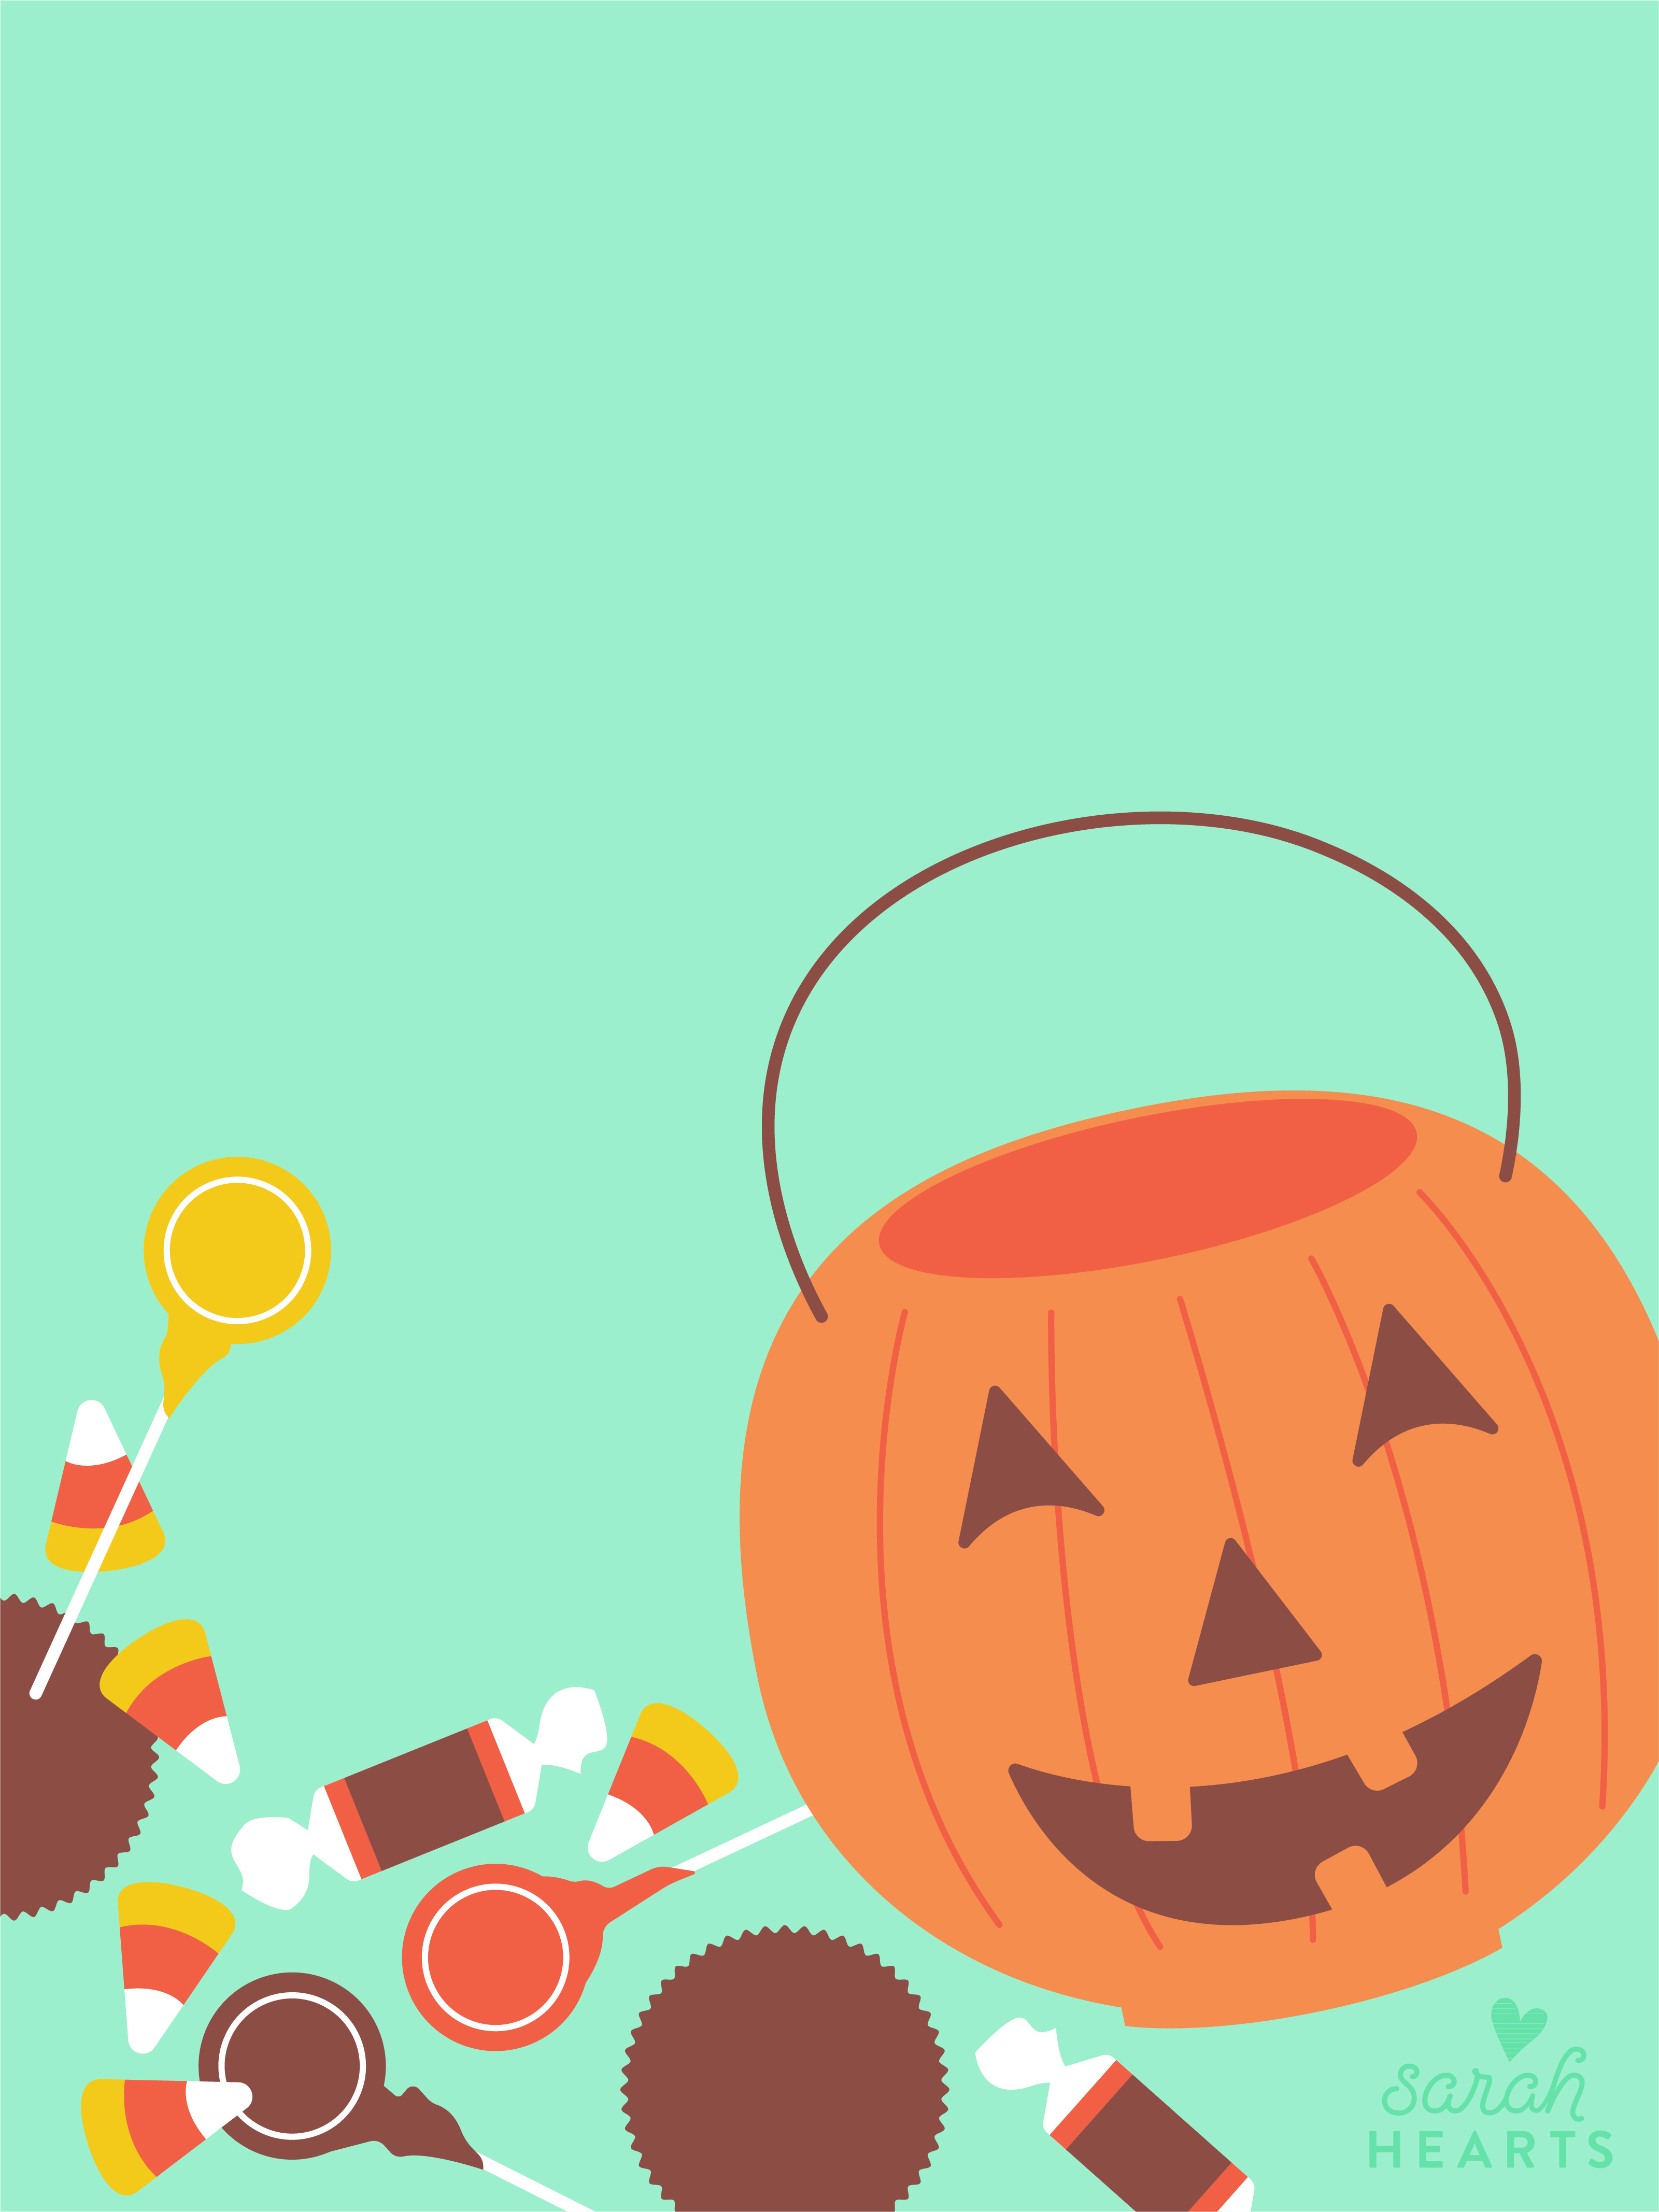 October 21 Halloween Candy Calendar Wallpaper   Sarah Hearts